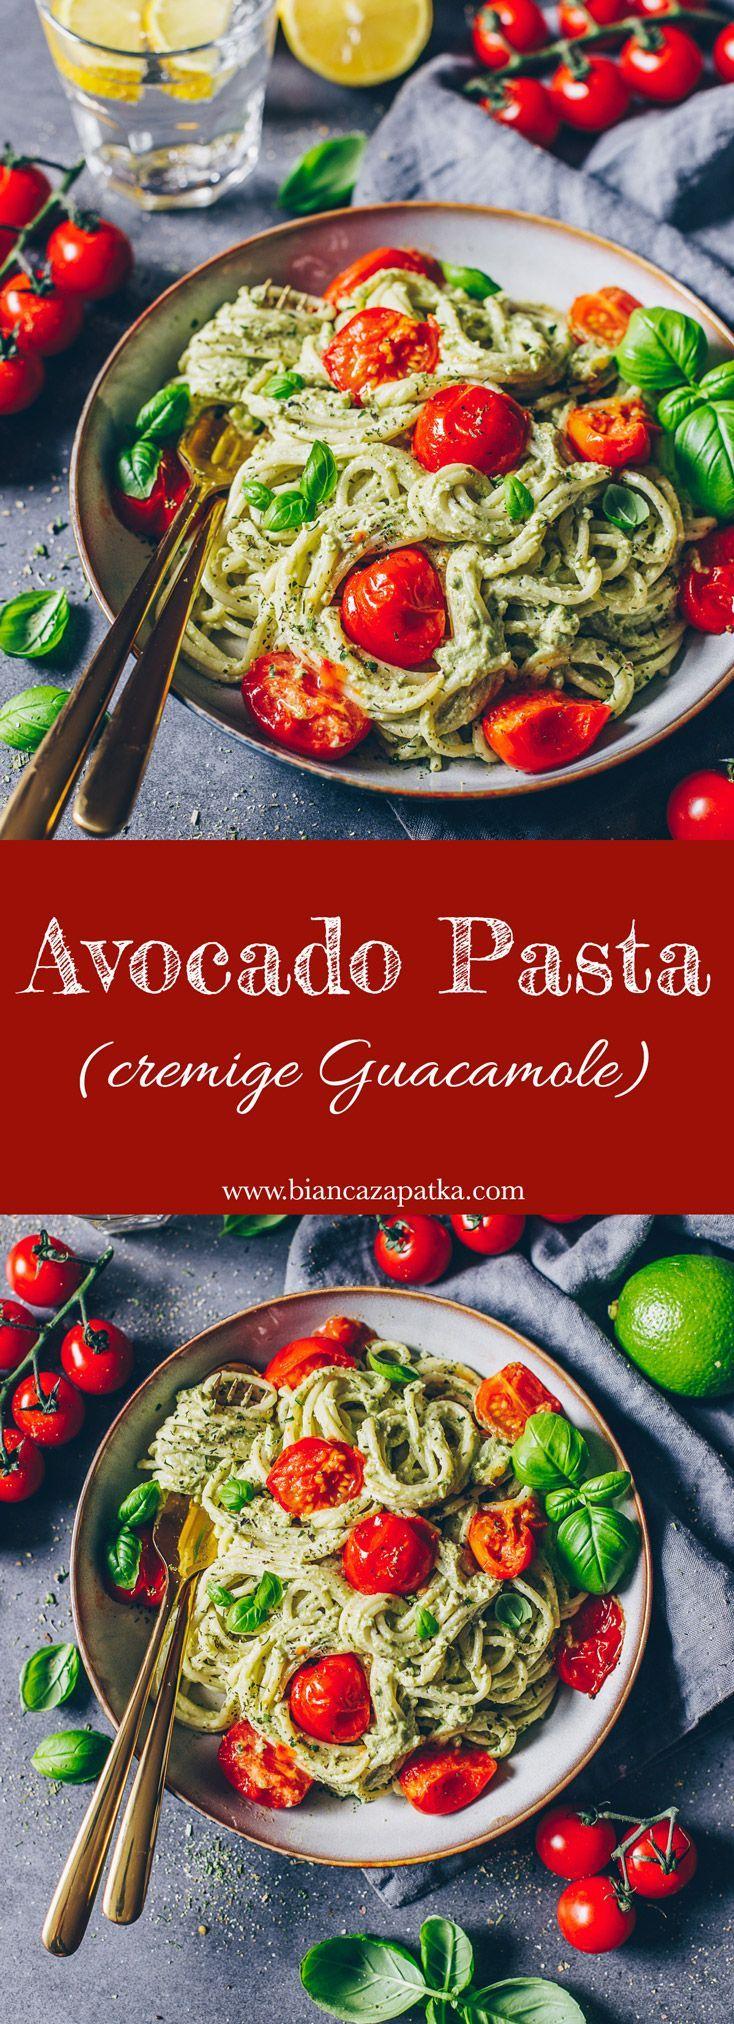 Avocadonudeln (cremige Guacamole)   – *Leckere  Pasta Rezepte*